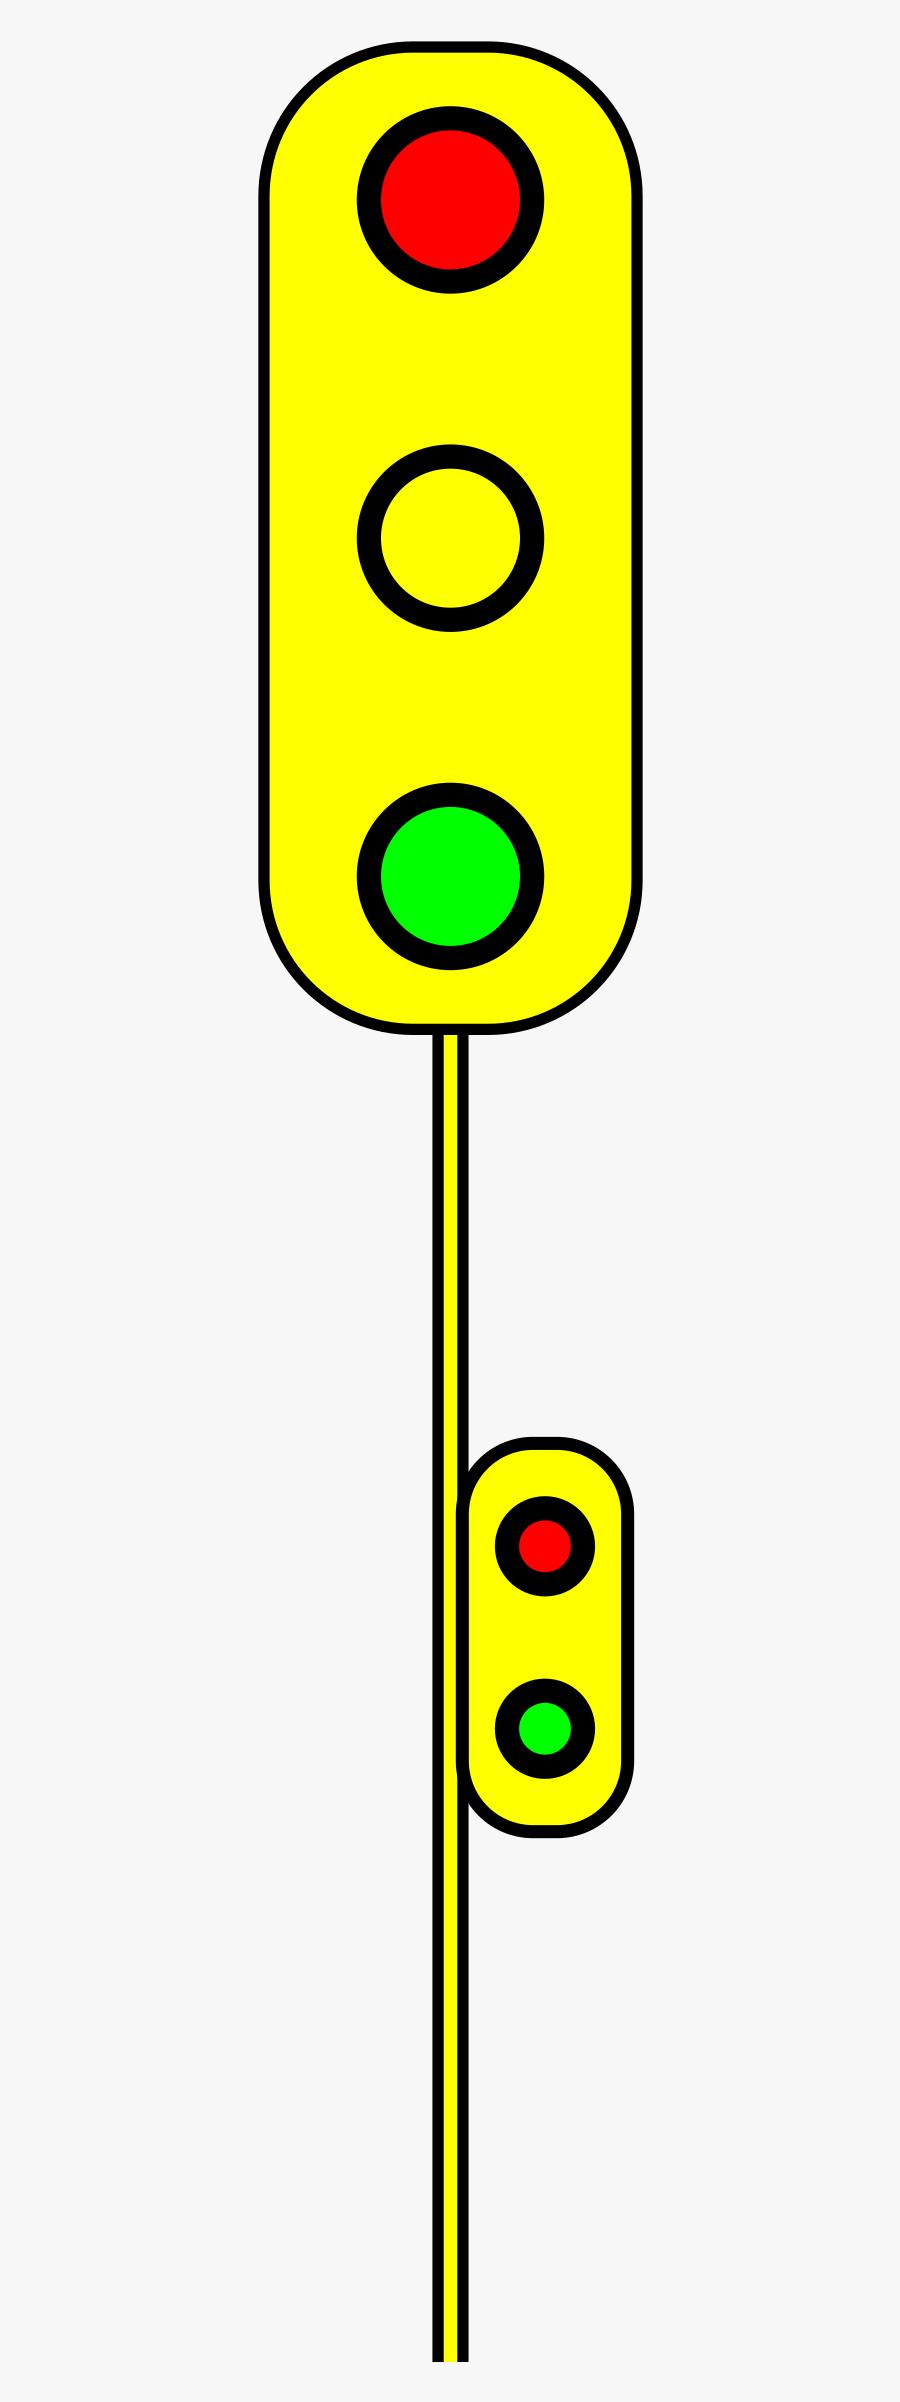 Traffic Light Clipart Small - Traffic Light, Transparent Clipart